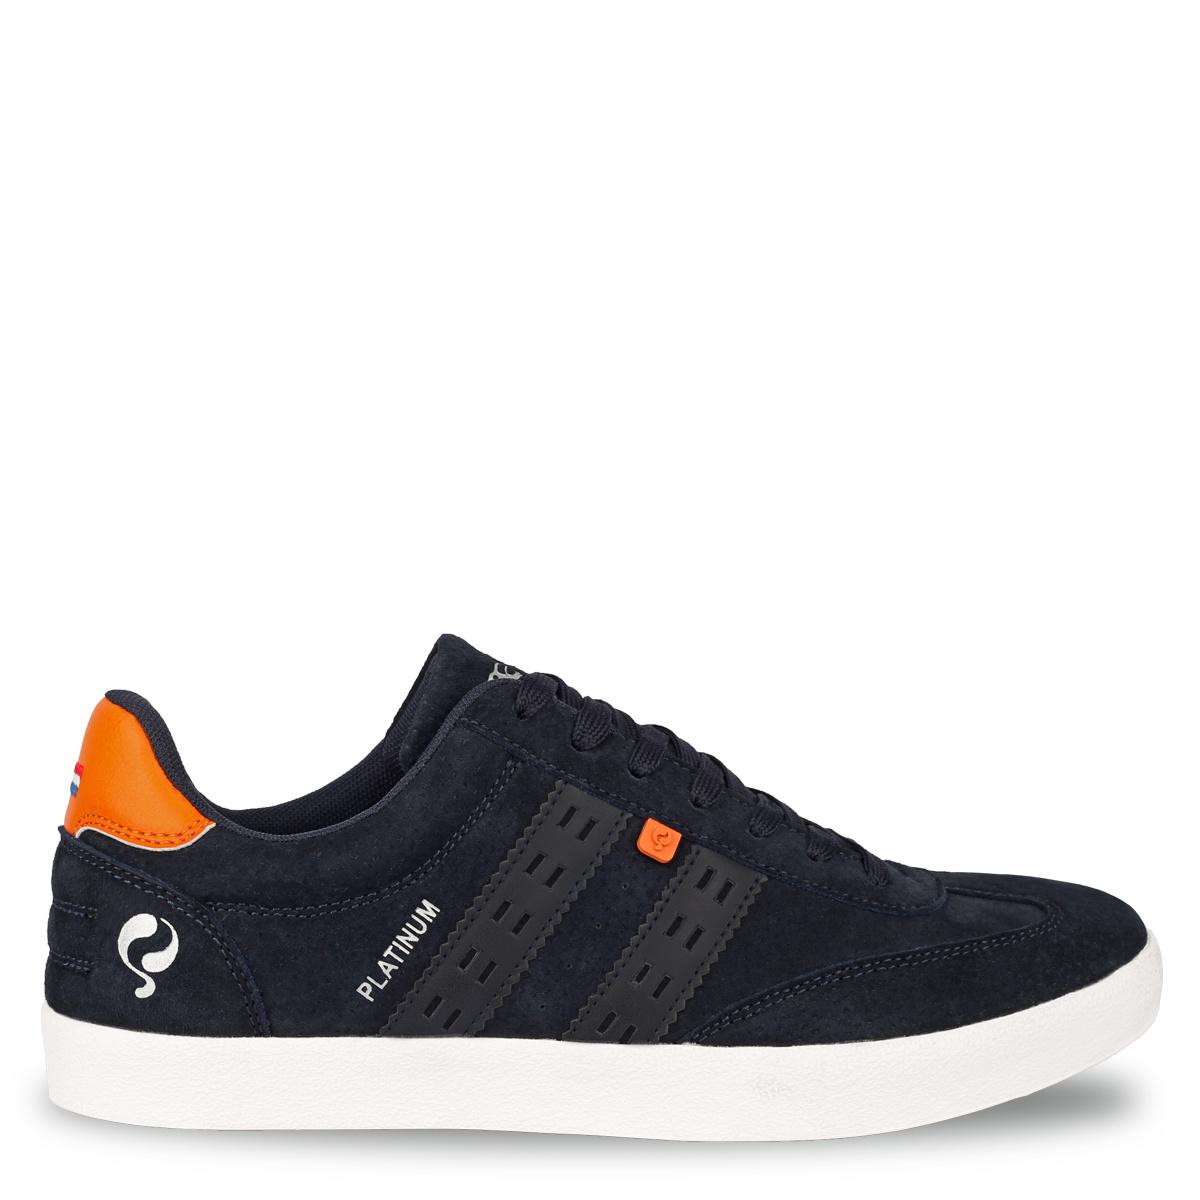 Heren Sneaker Platinum Donkerblauw Oranje